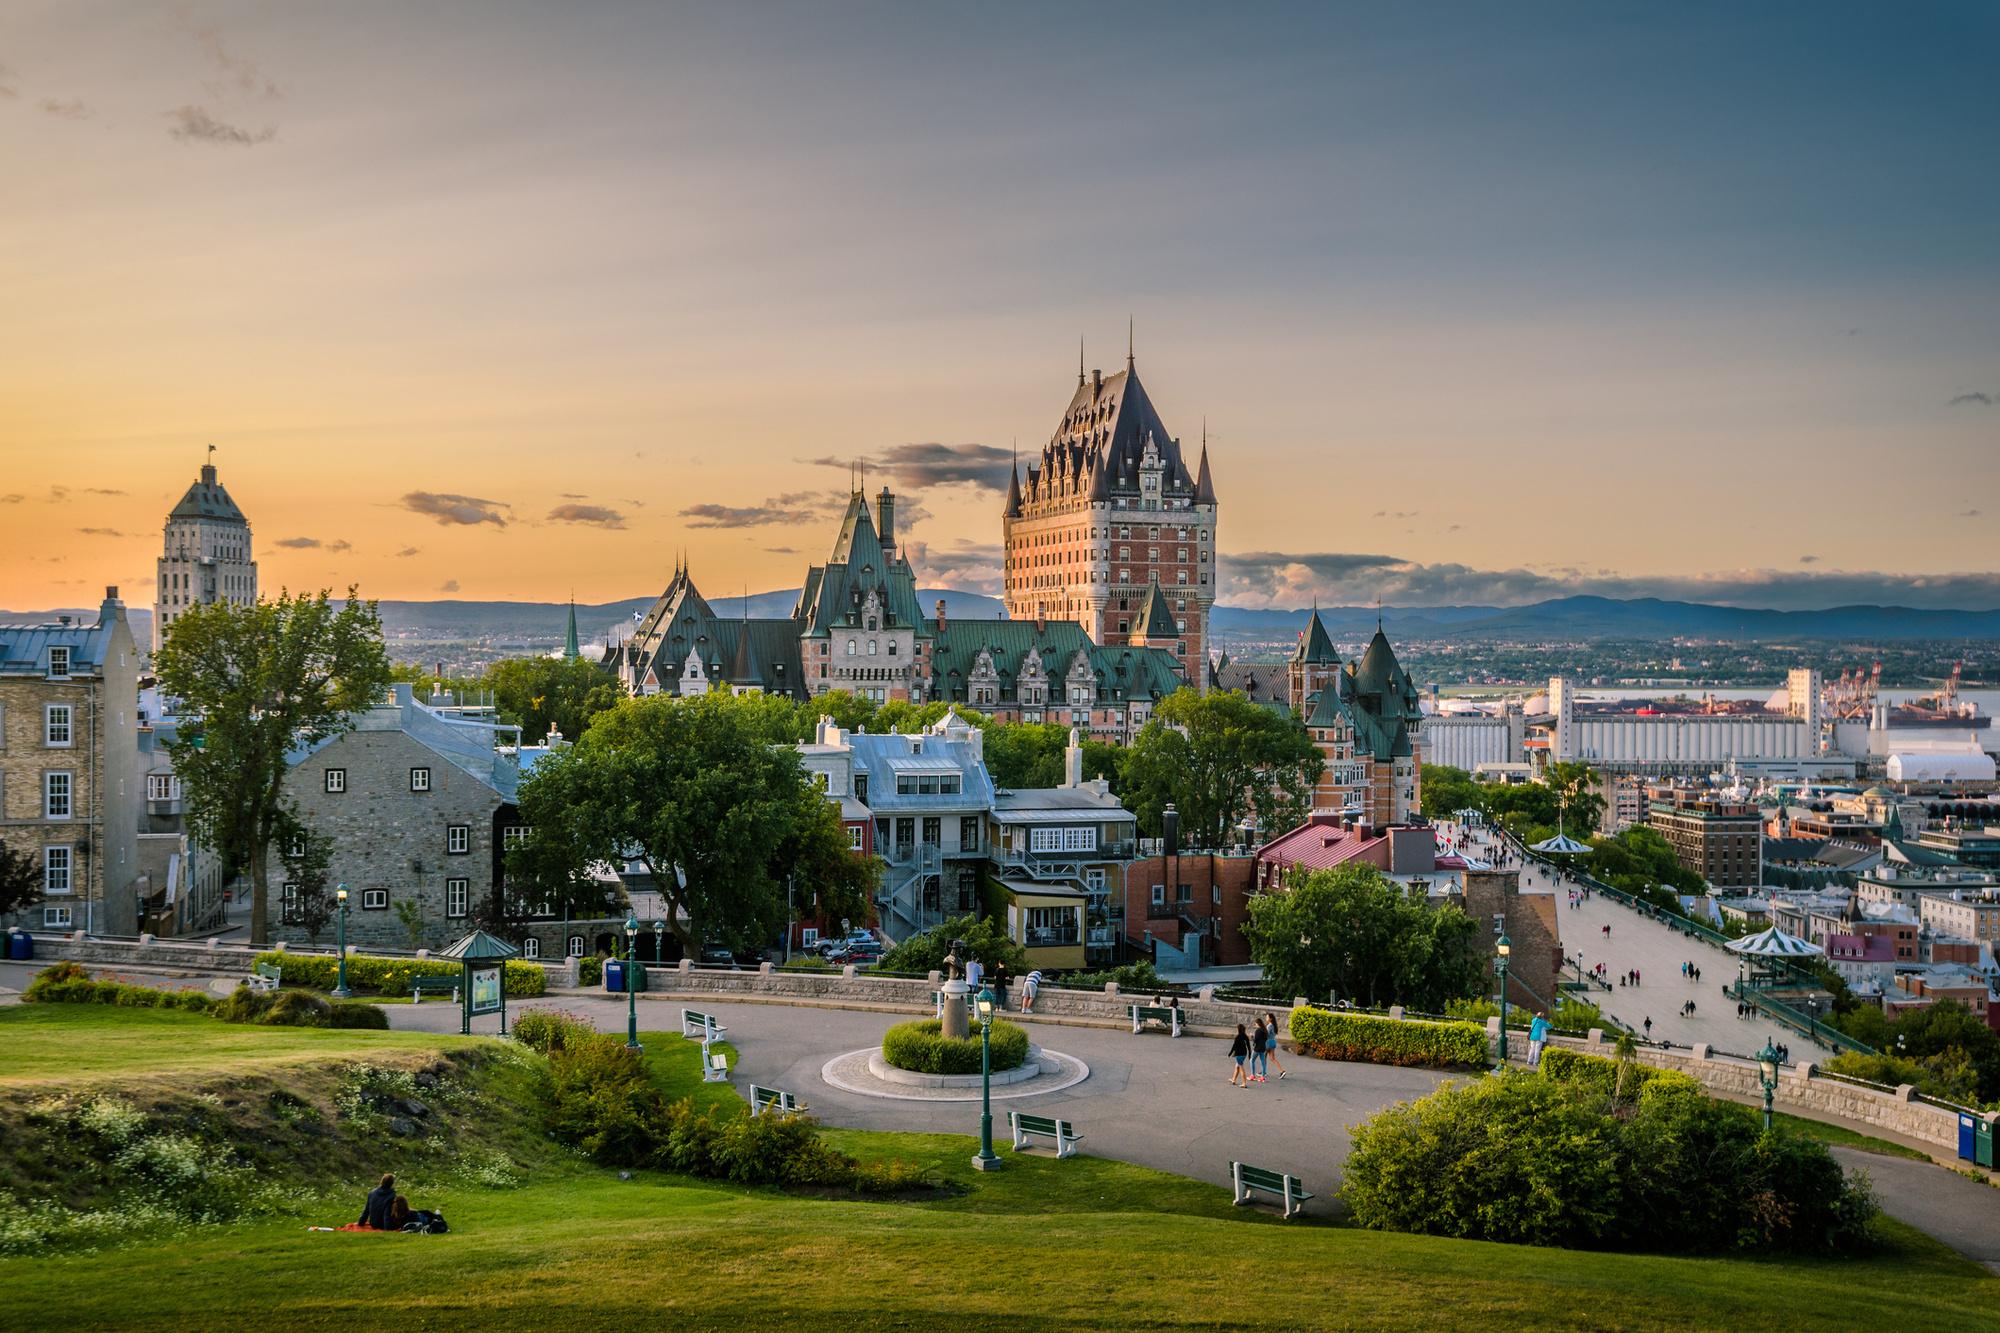 Québec (Canada), iStock